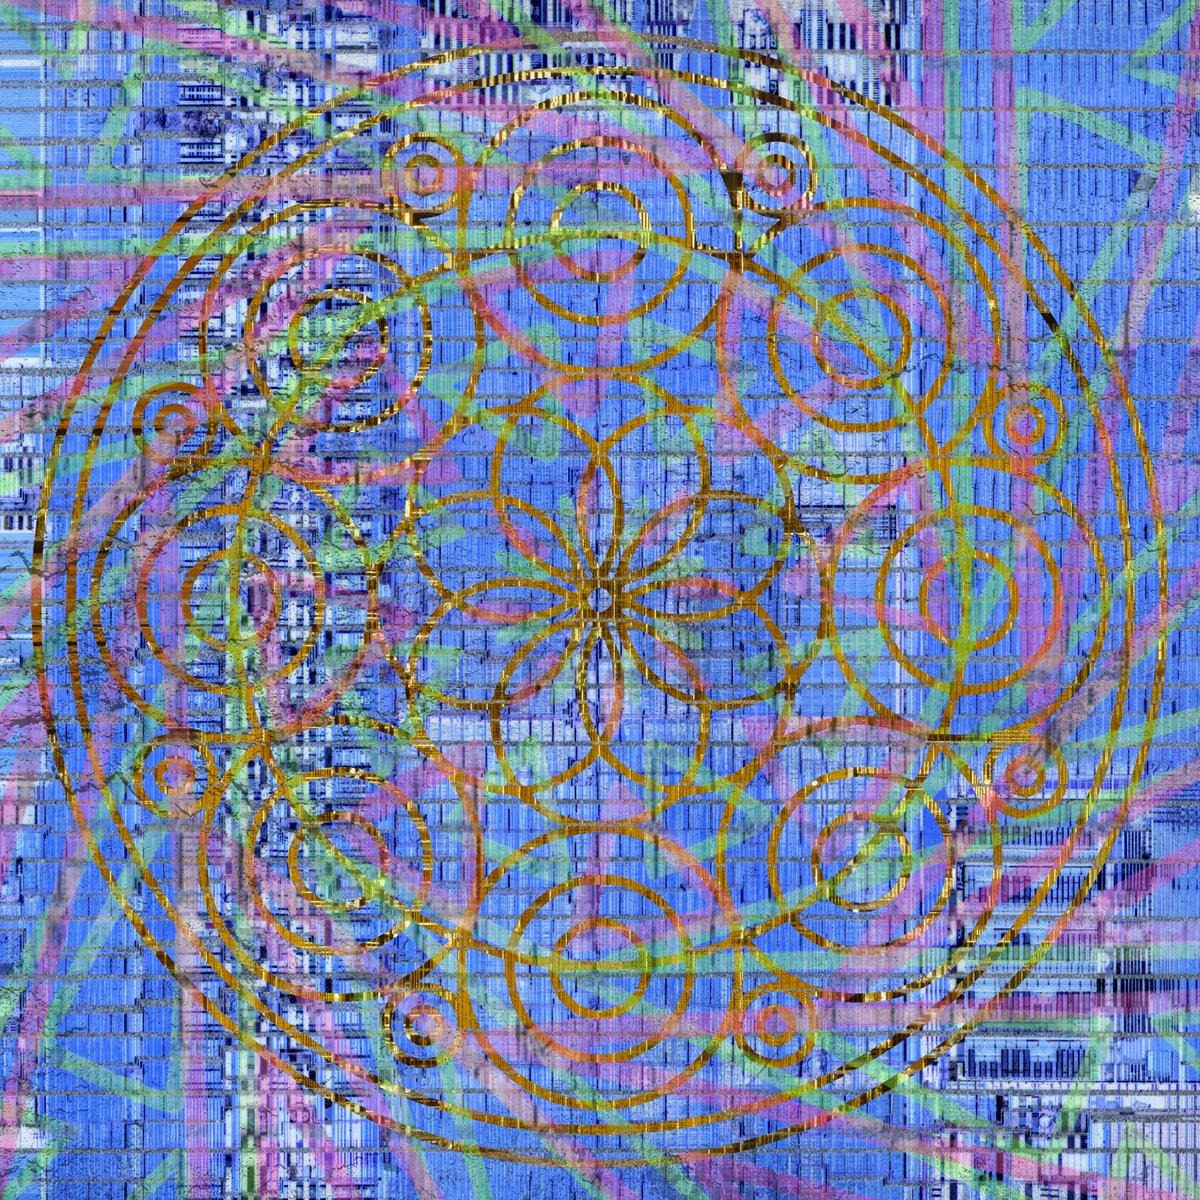 Released: October 26th, 2017   Genres: Psytrance, Experimental